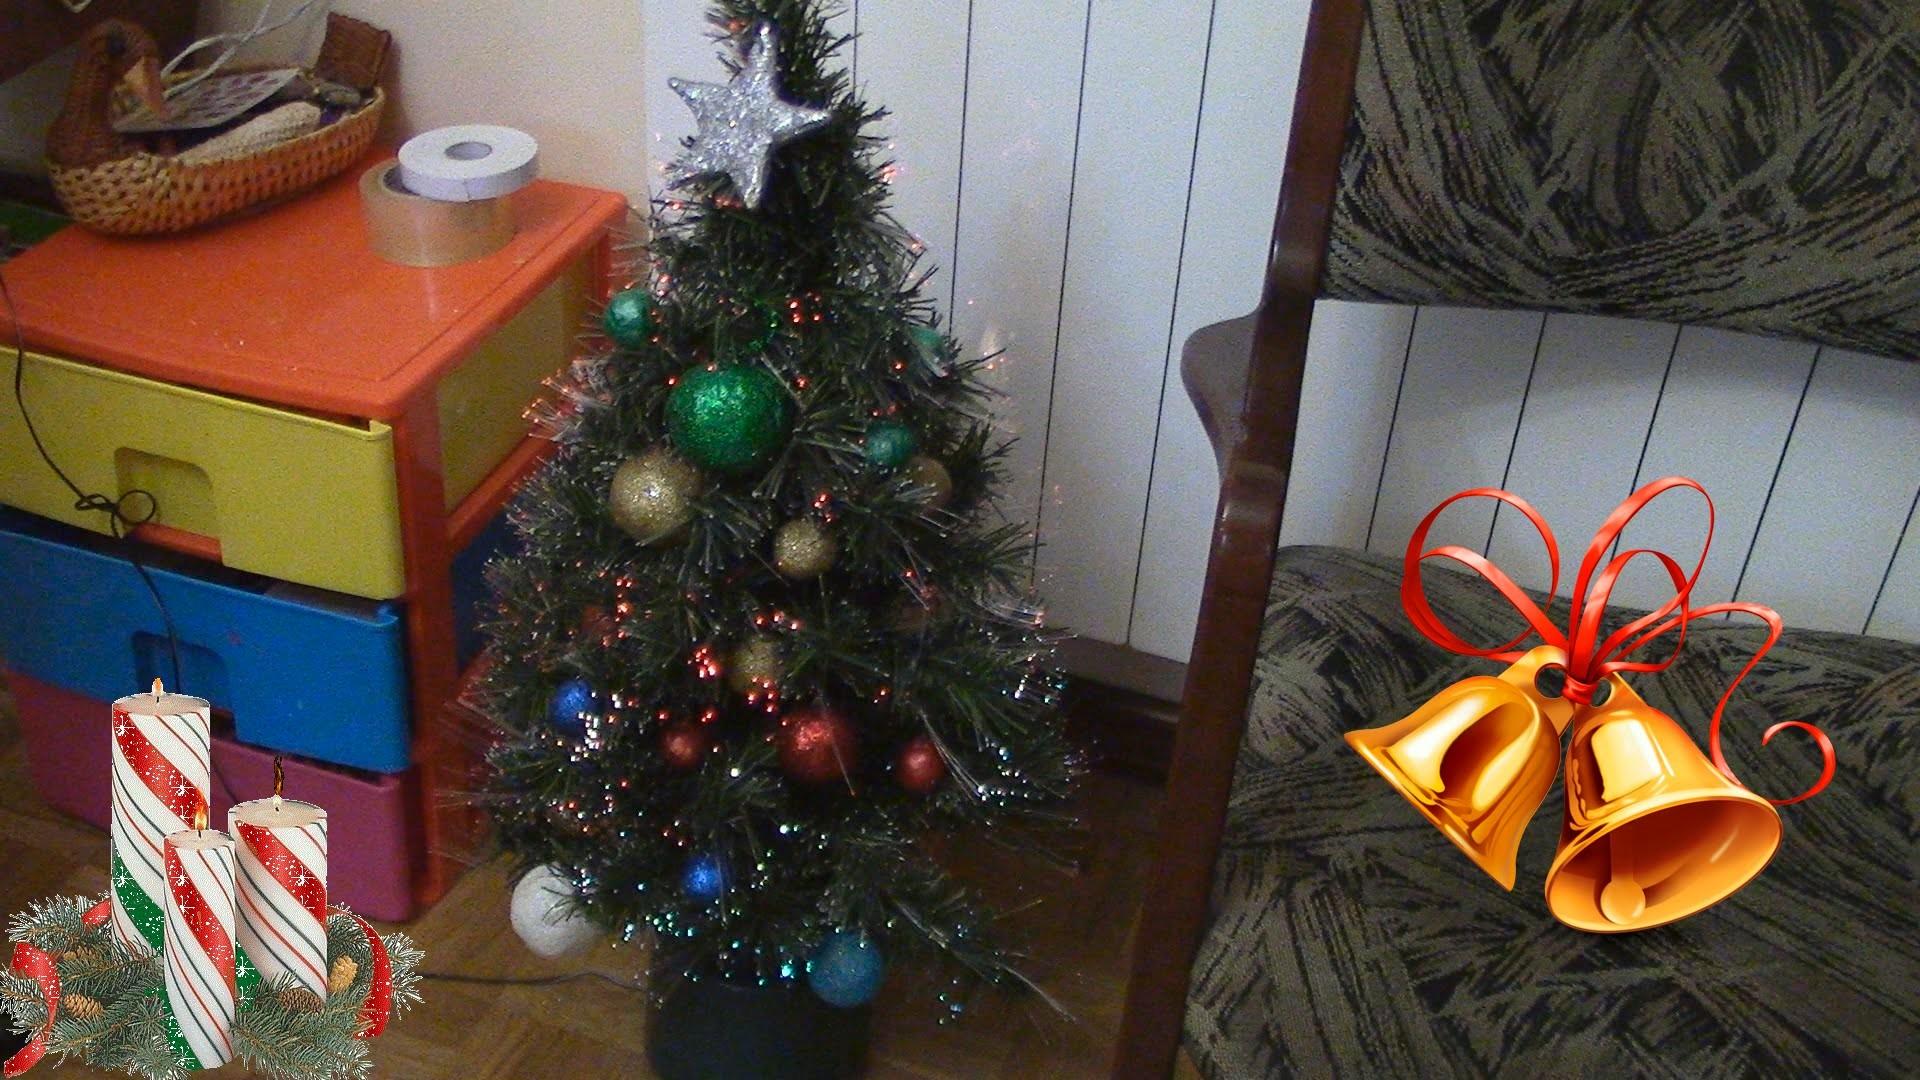 ESFERAS NAVIDEÑAS - CHRISTMAS SPHERES